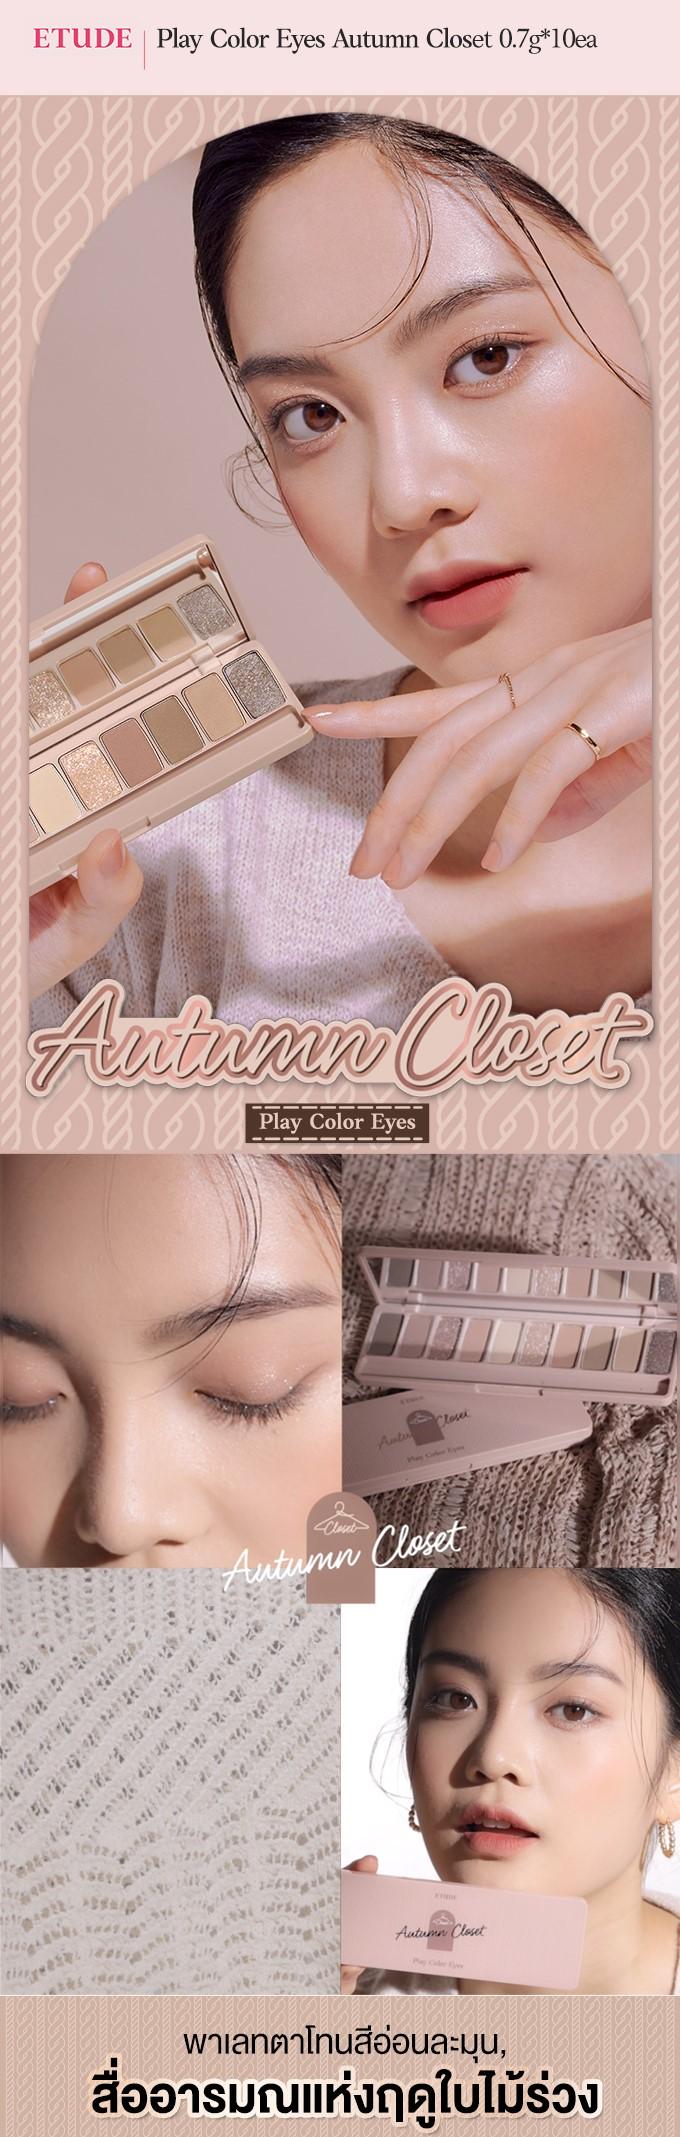 play_color_eyes_autumn_closet_TH_1